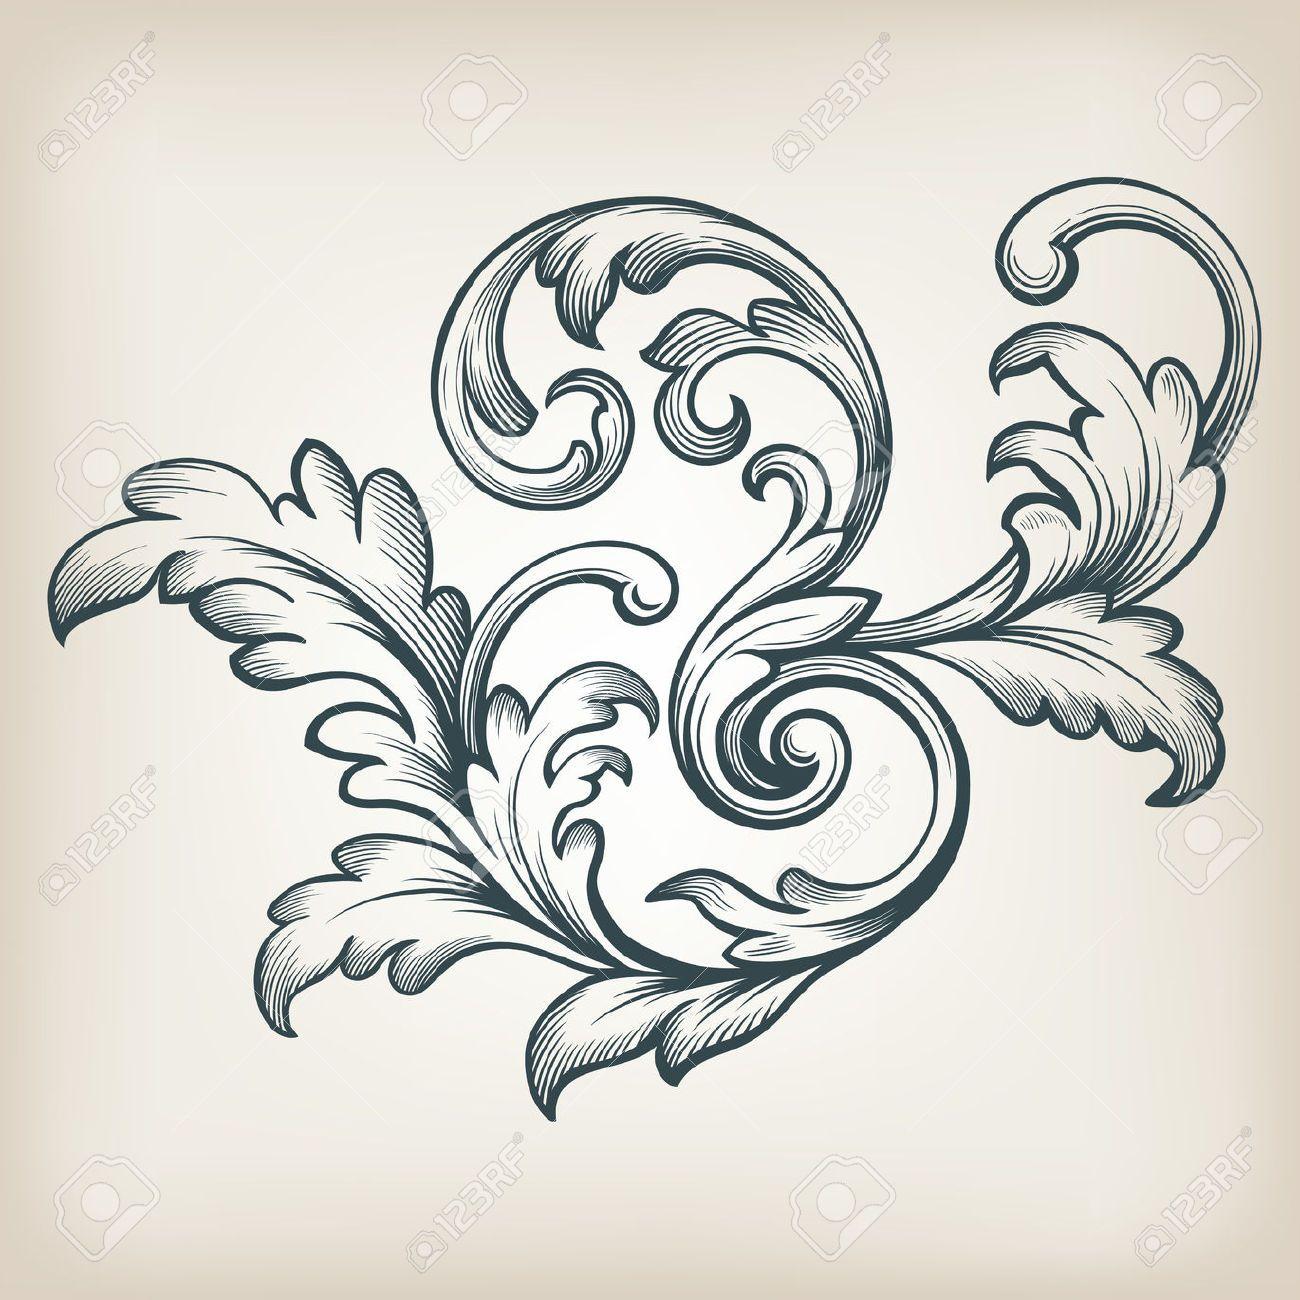 Vintage Barock Rolleentwurf Rahmen Gravur Akanthus Blumengrenze Musterelement Retro Stil Filigrane Vektor Filigrane Tatowierung Barock Mandala Selber Malen